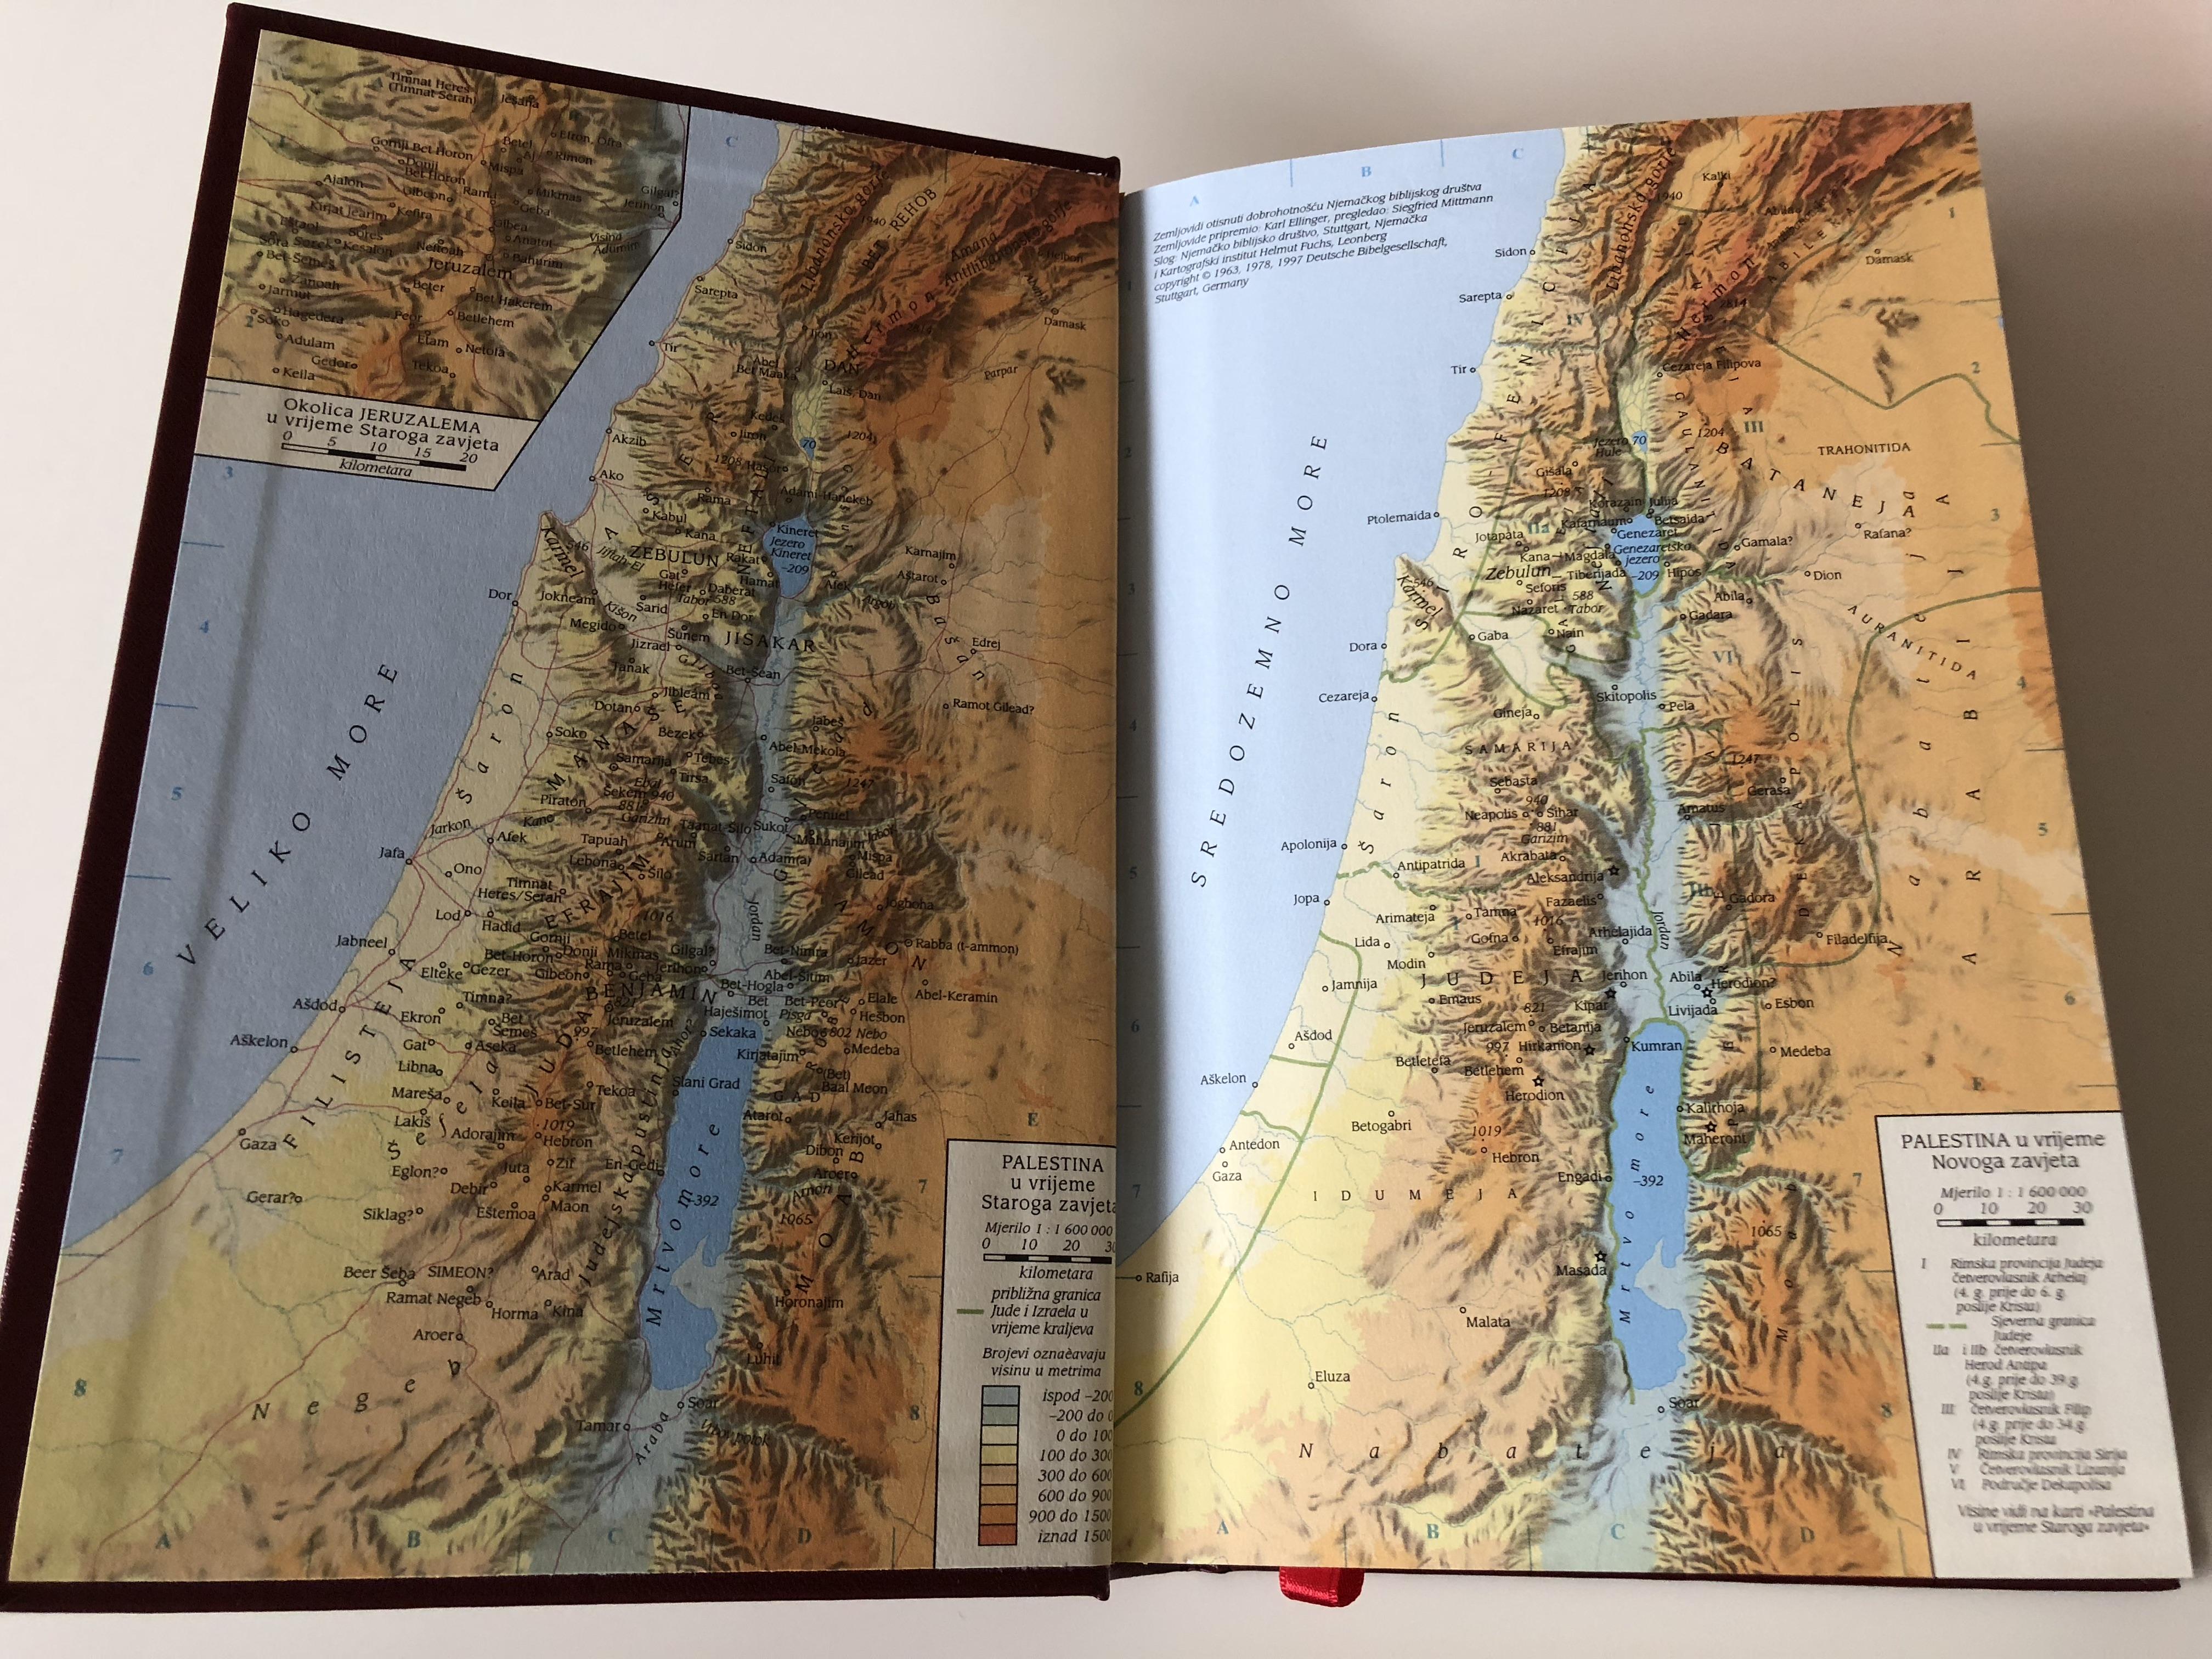 croatian-bible-with-deuterocanonical-books-burg-4-.jpg